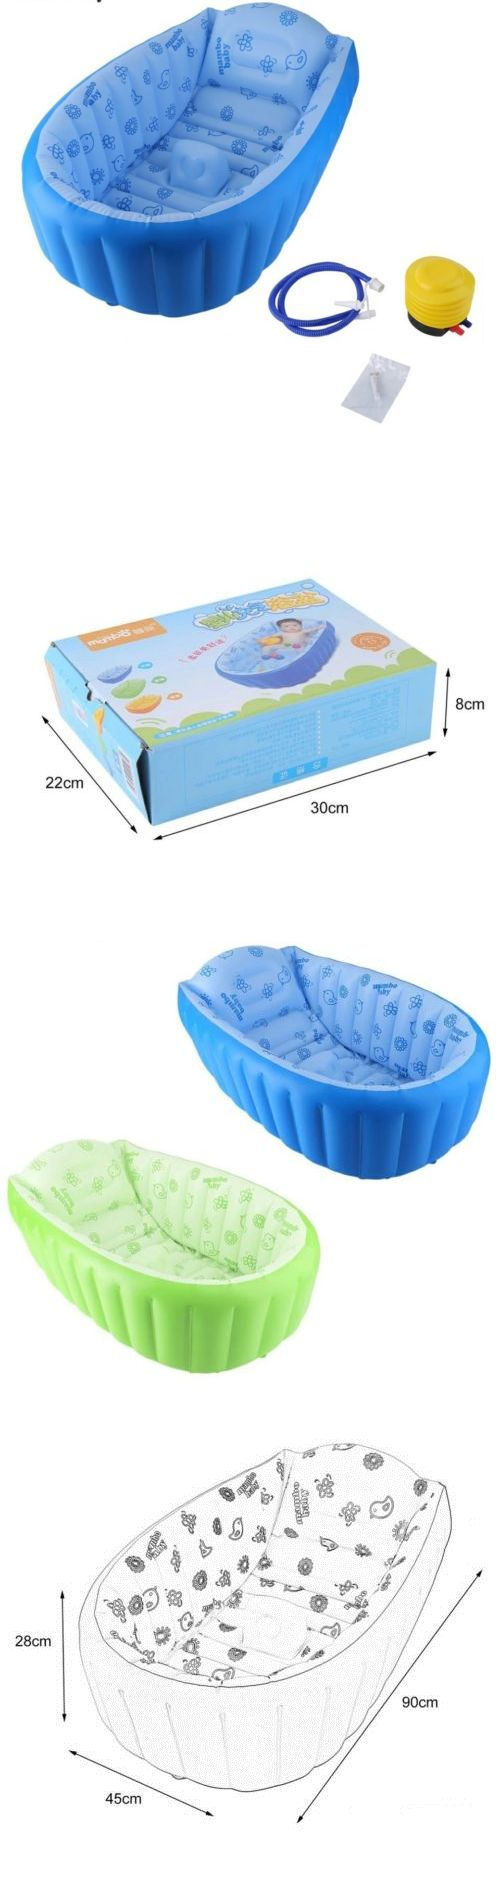 Bath Tub Seats and Rings 162024: Baby Bath Tub Ring Seat Keter Blue ...